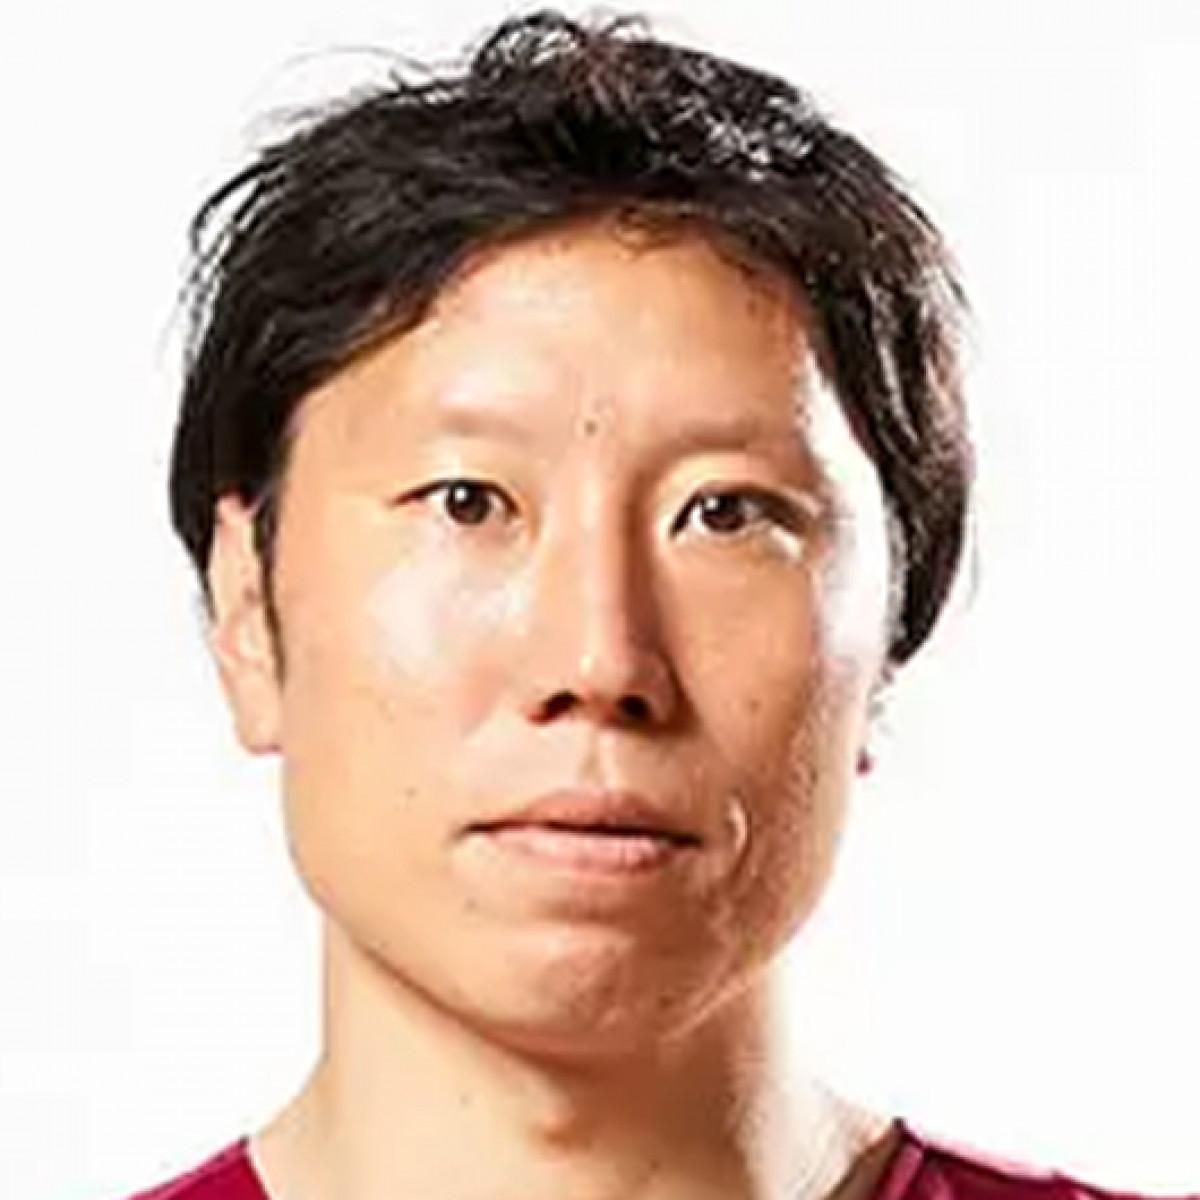 Toshinori Tanio